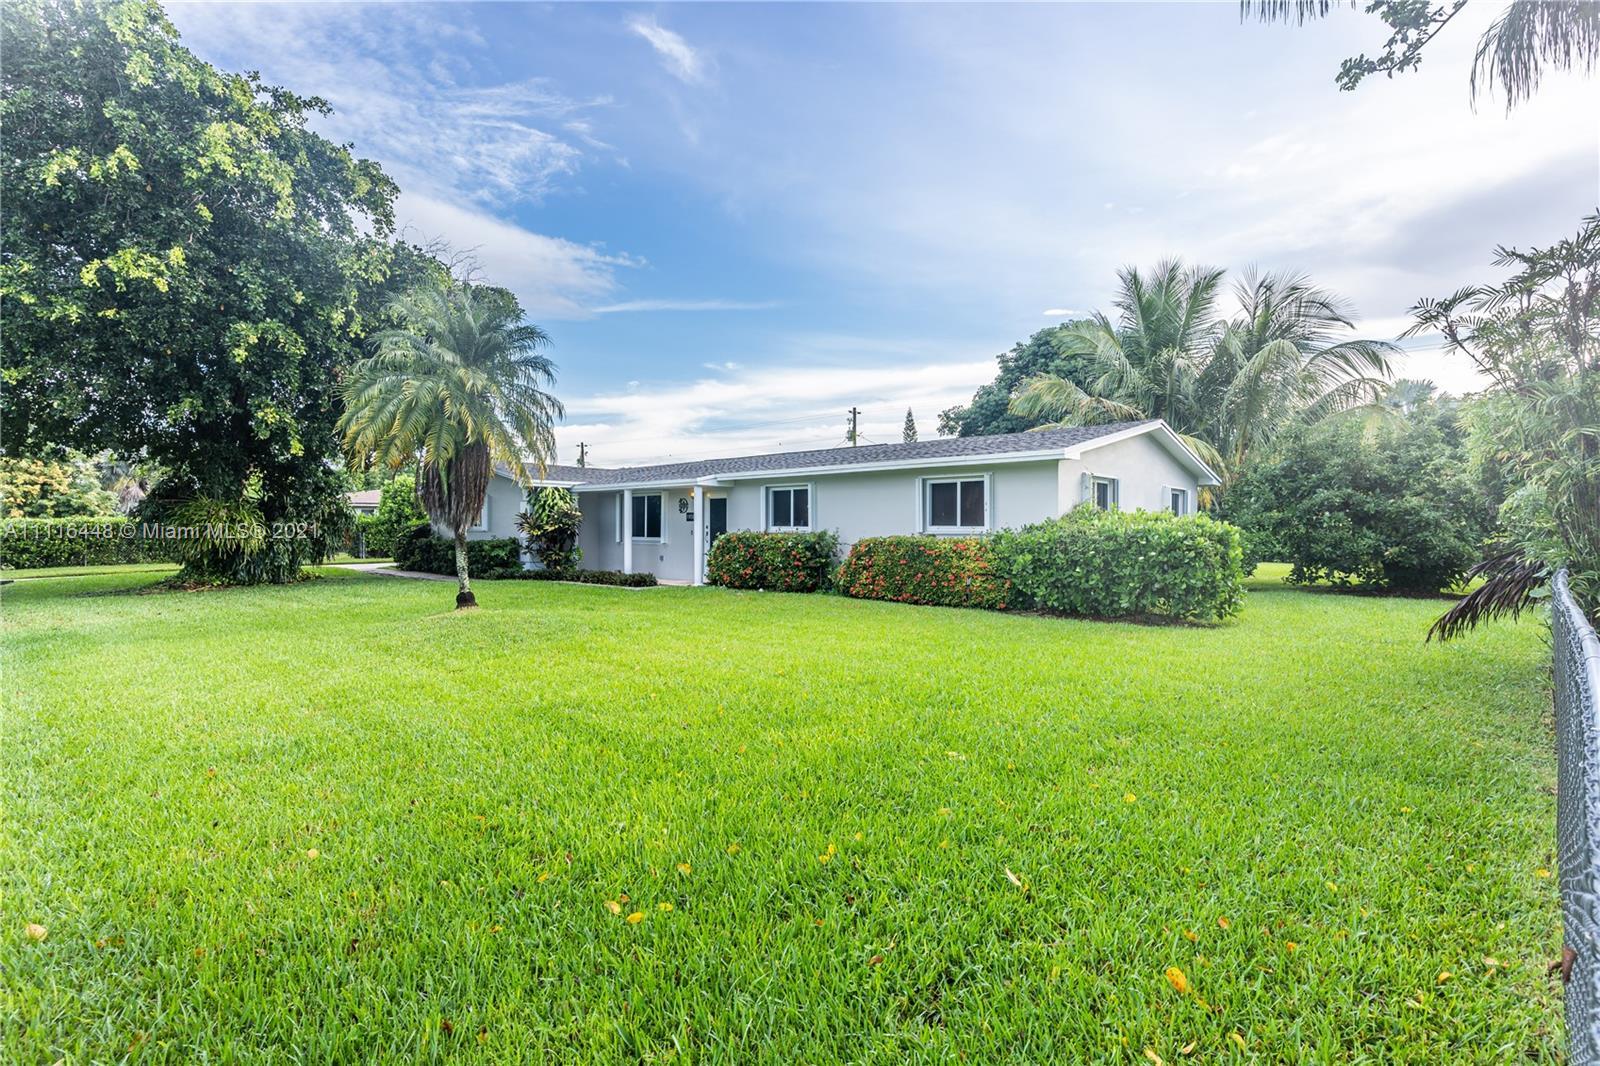 Single Family Home For Sale TROPICO ESTATES2,046 Sqft